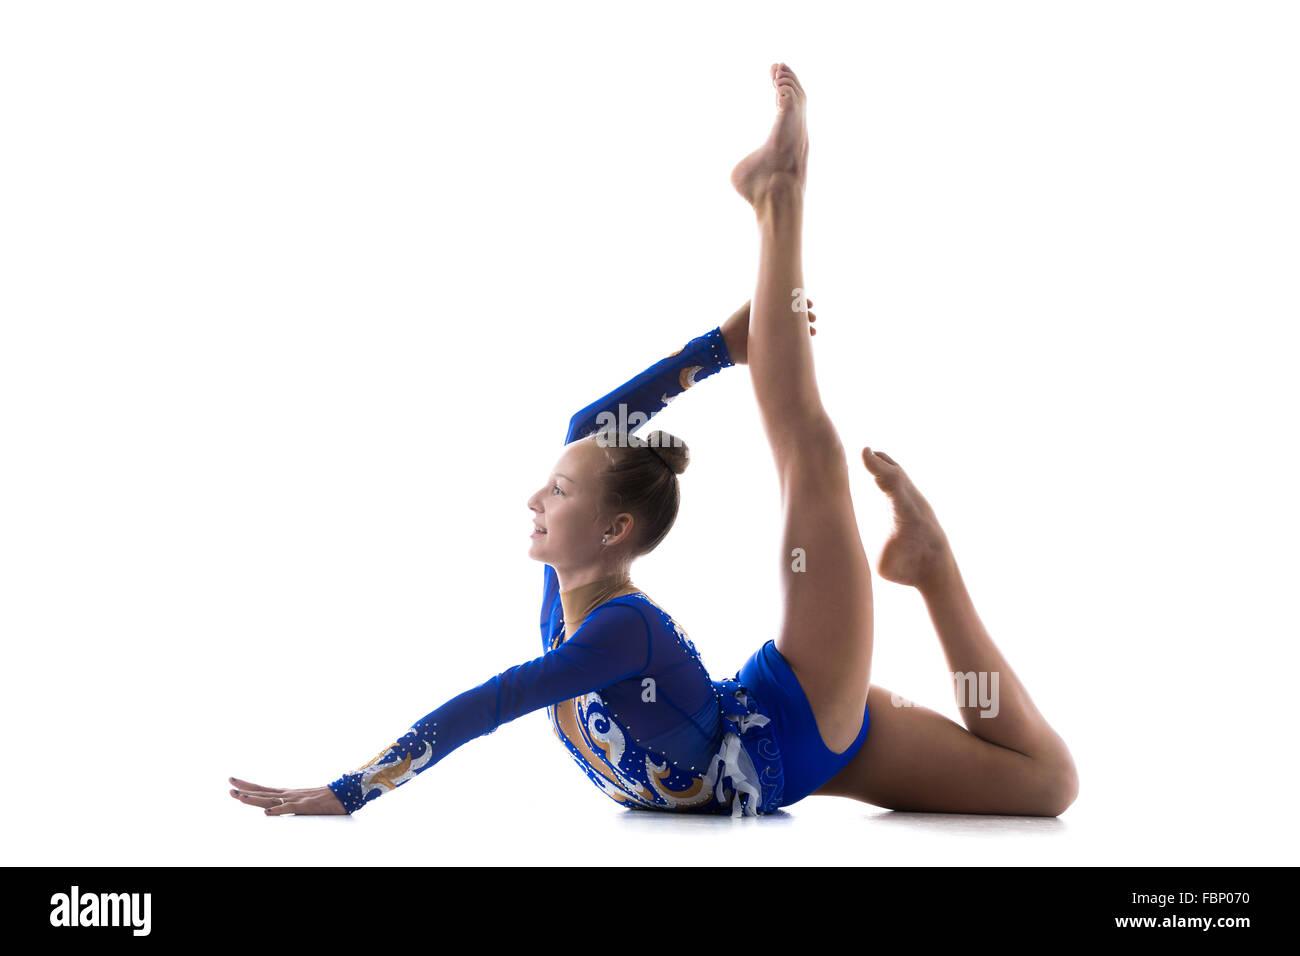 Beautiful smiling gymnast athlete teenage girl wearing dancer blue leotard working out, dancing, posing, doing art - Stock Image